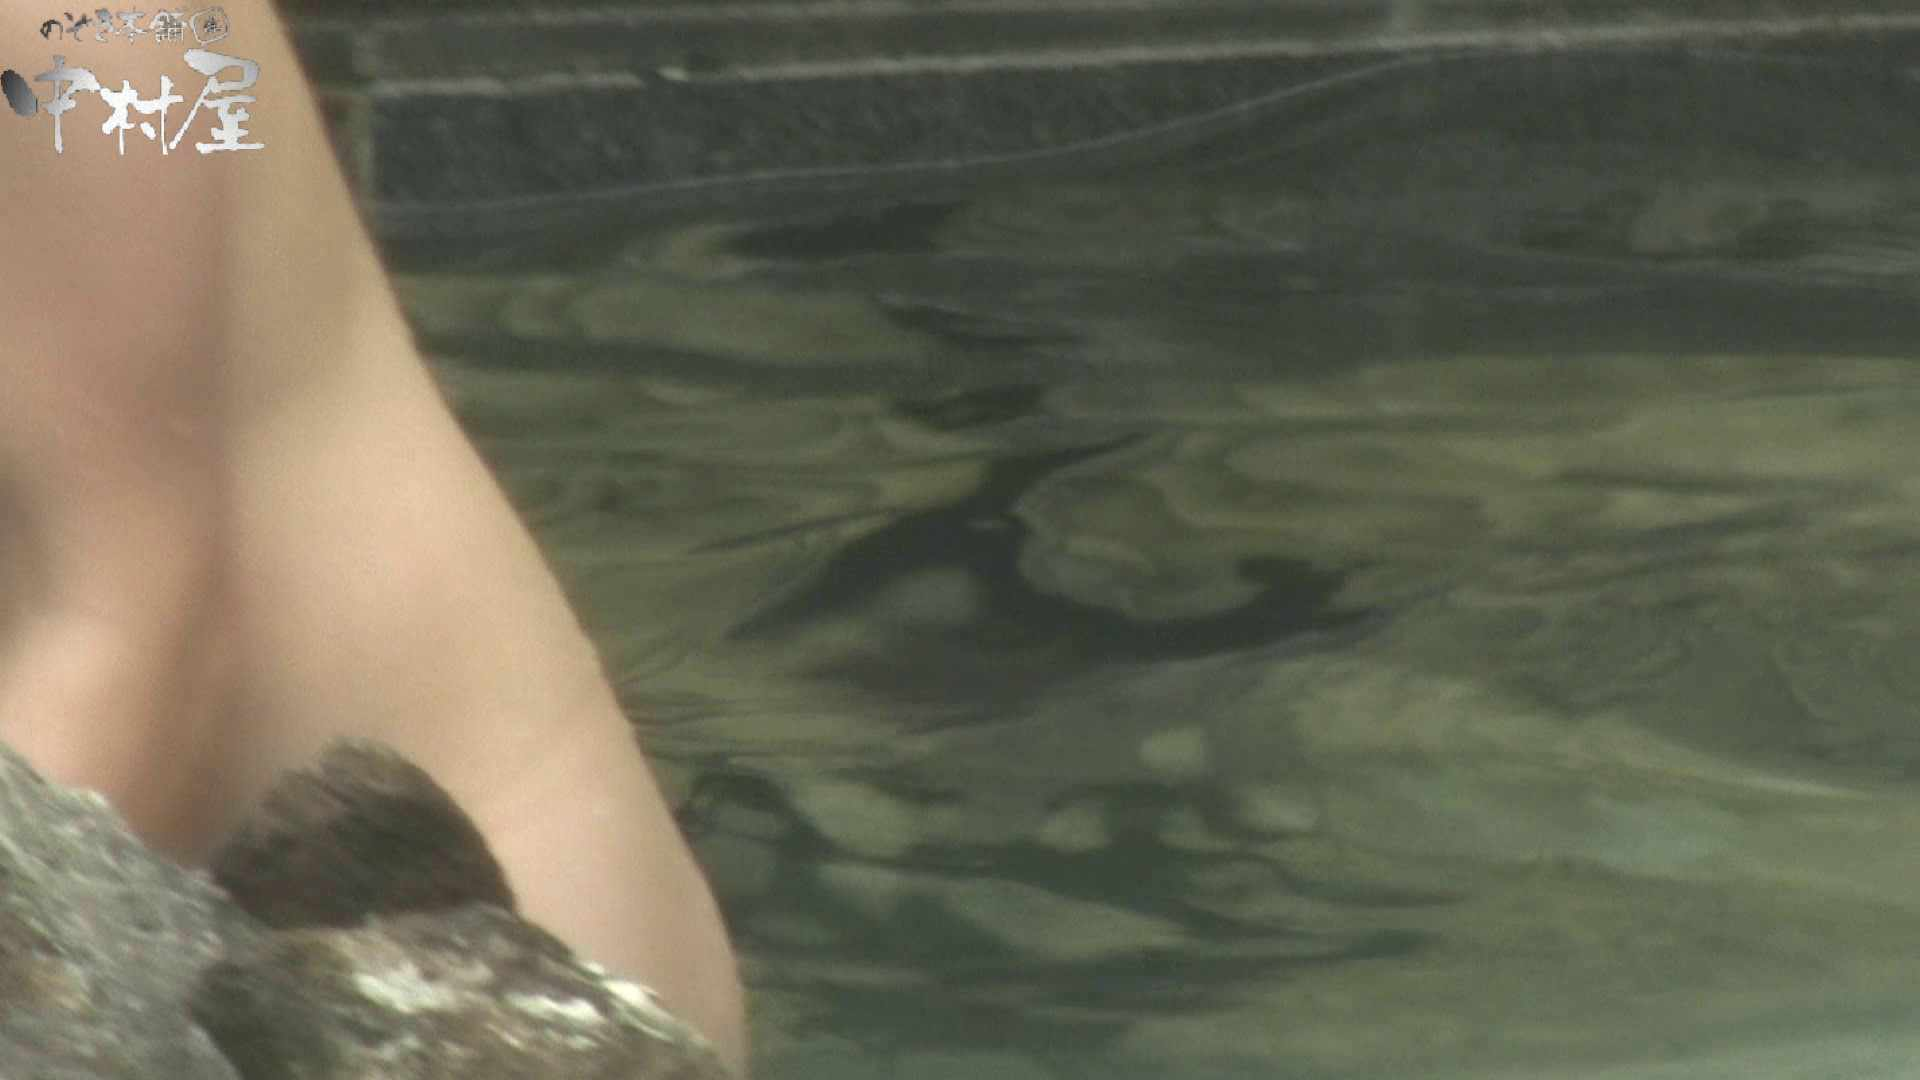 Aquaな露天風呂Vol.905 露天風呂   OLのエロ生活  99連発 64